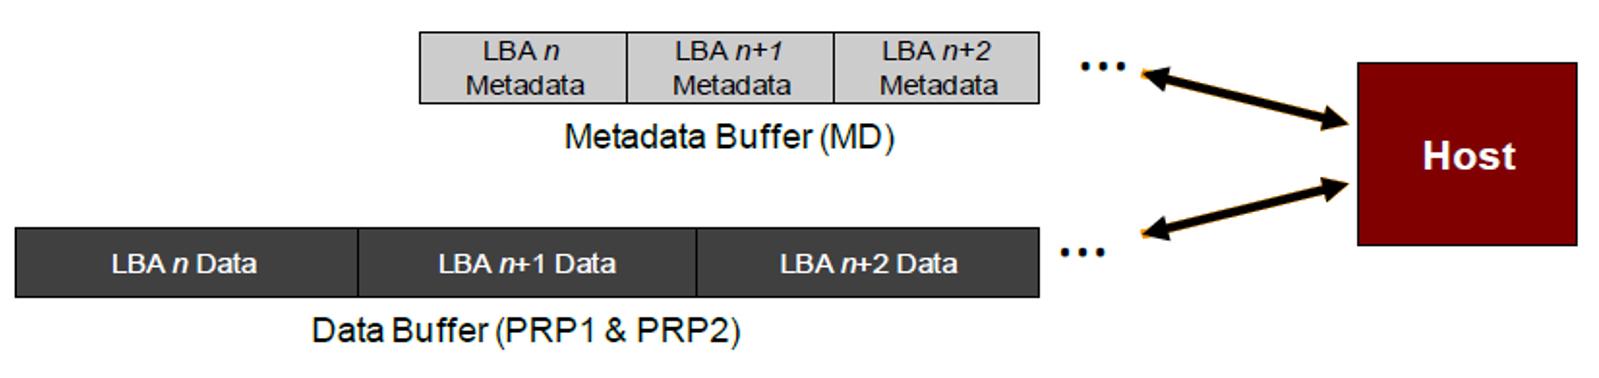 fig-4-metadata-buffer